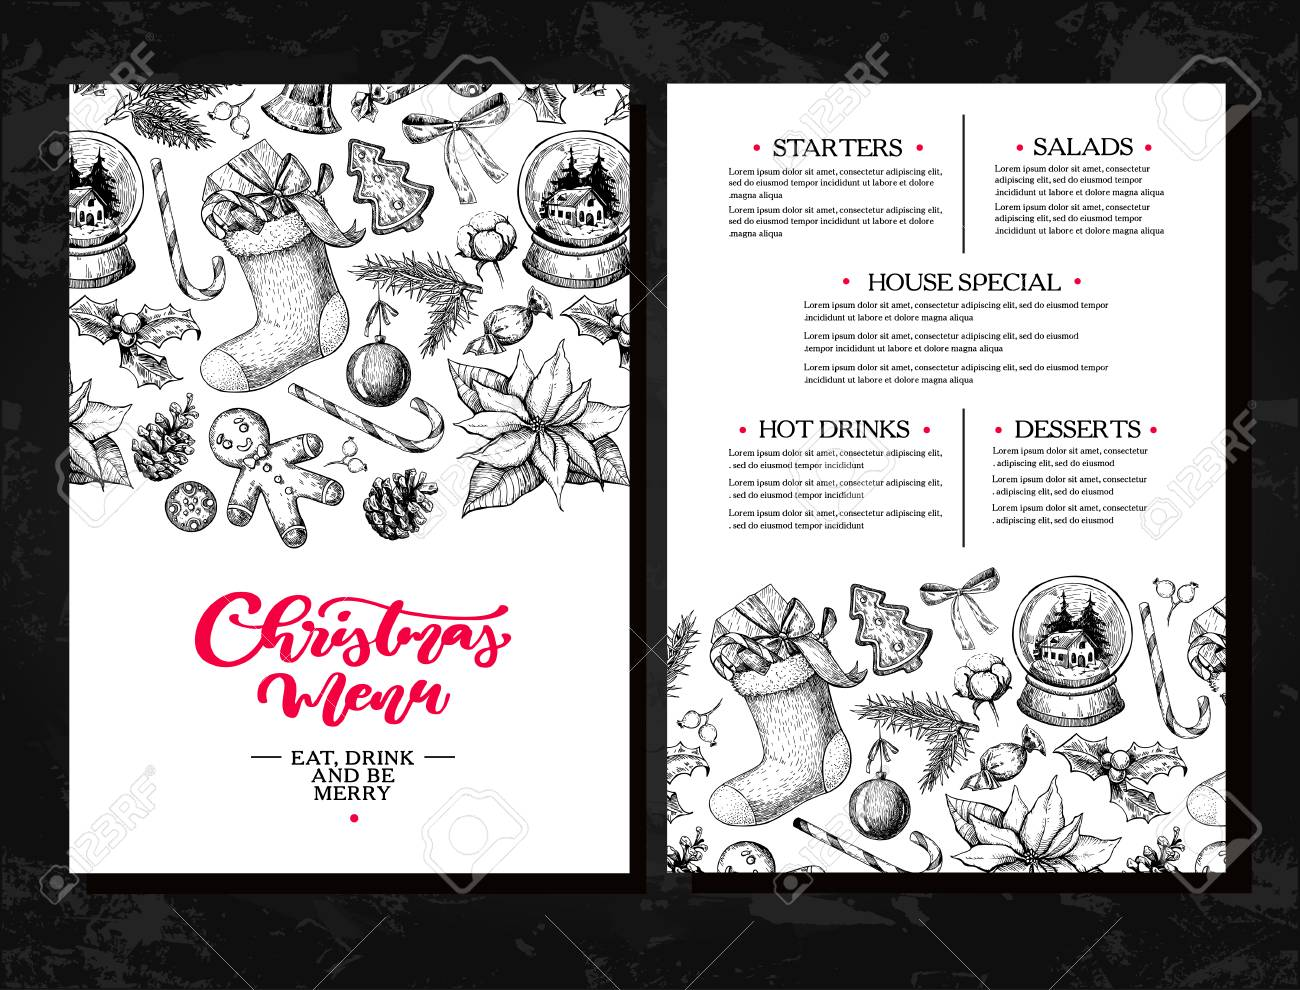 christmas menu design royalty free cliparts vectors and stock